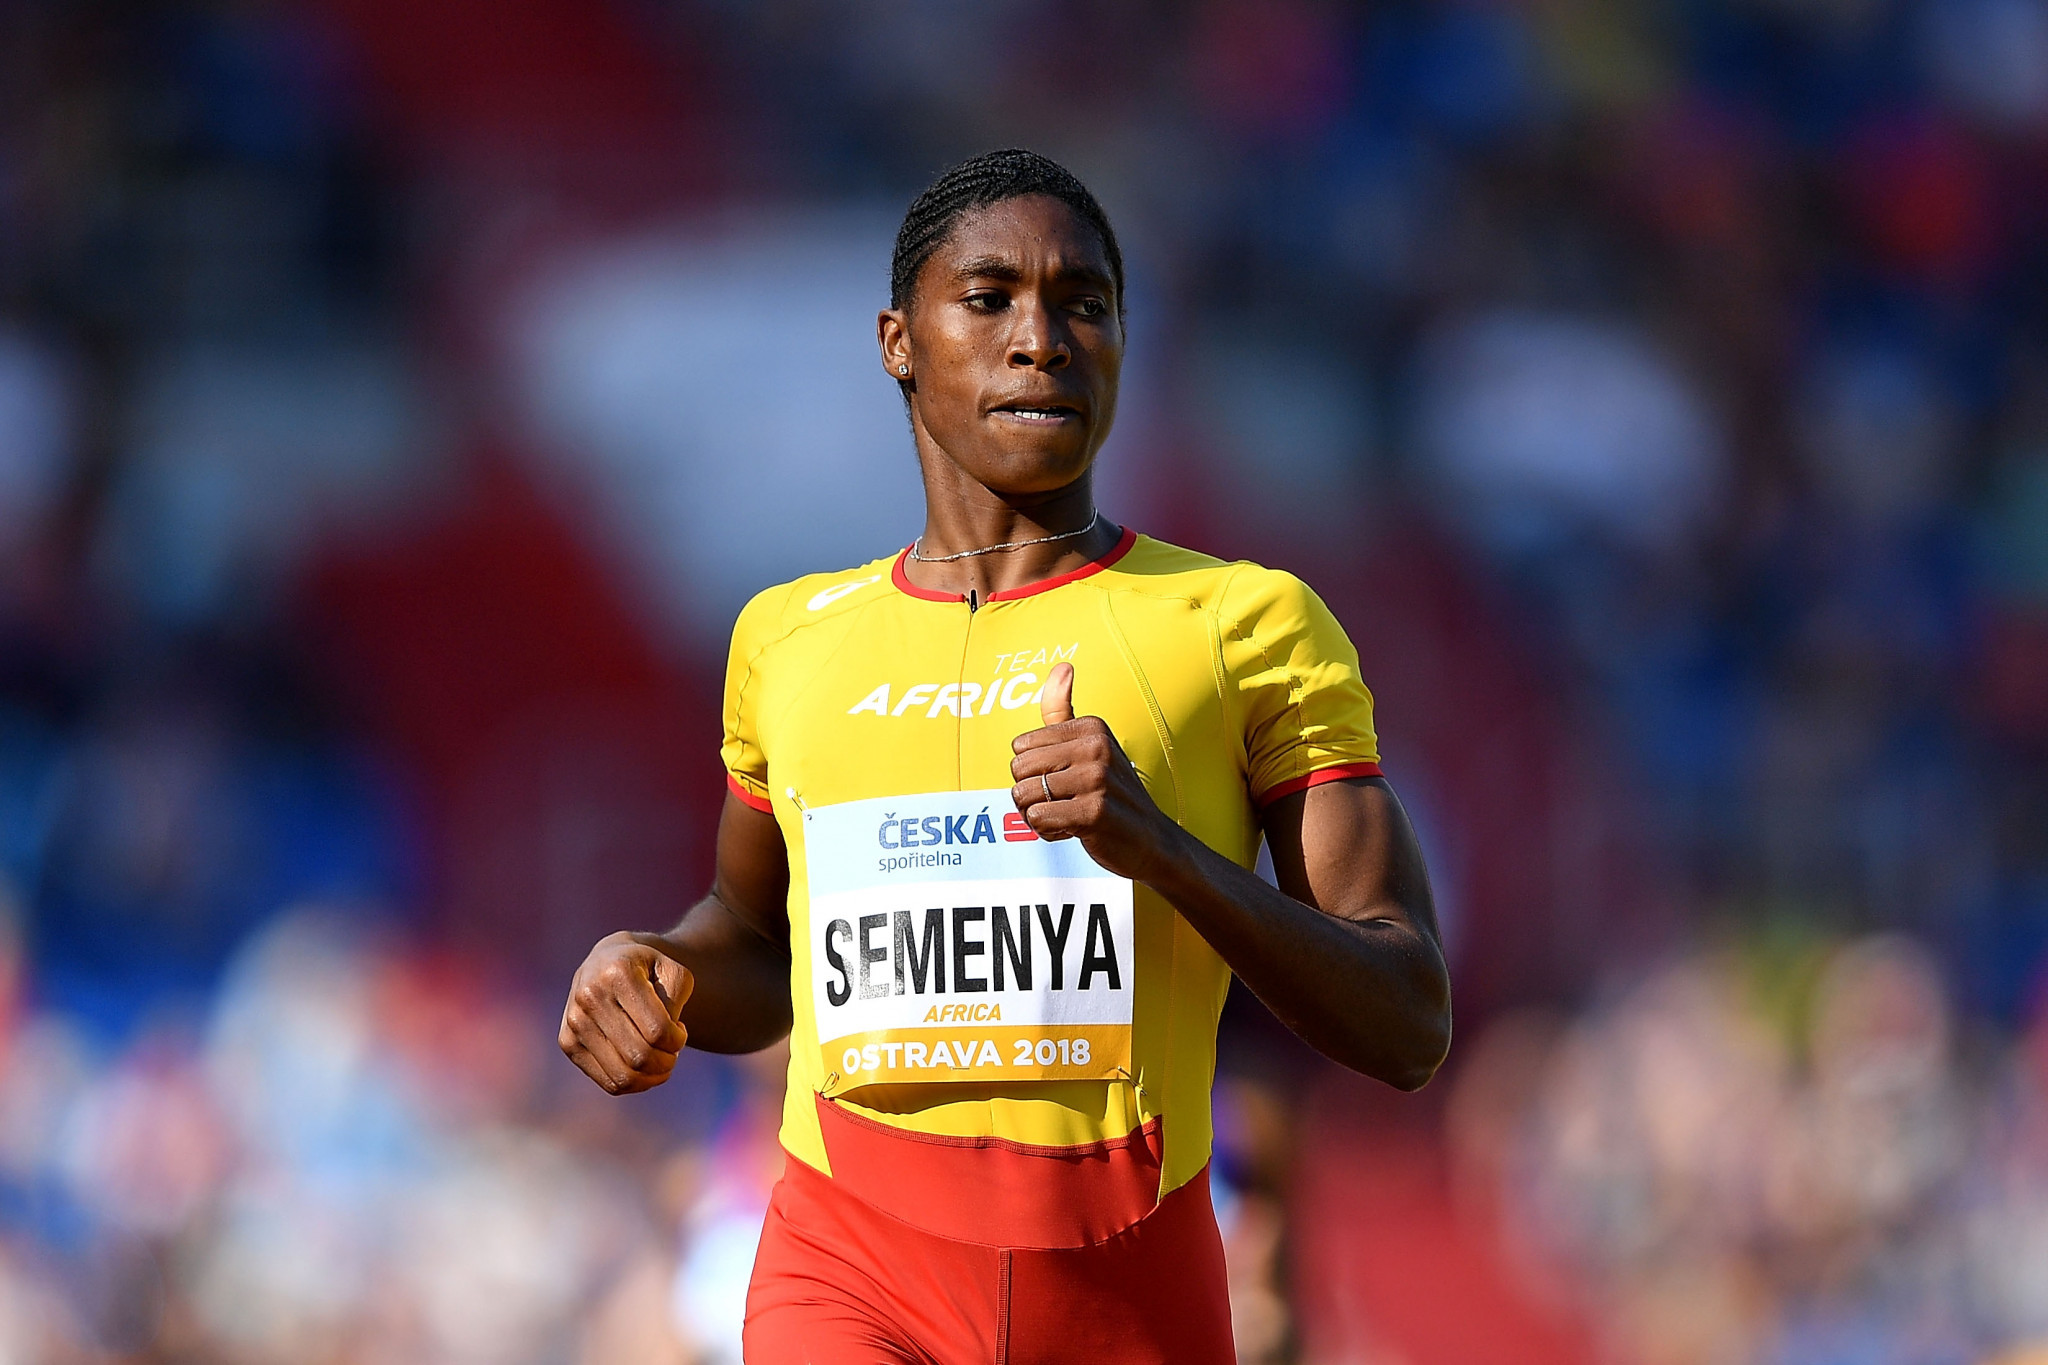 Semenya ready to run 800m as IAAF Diamond League opens in Doha